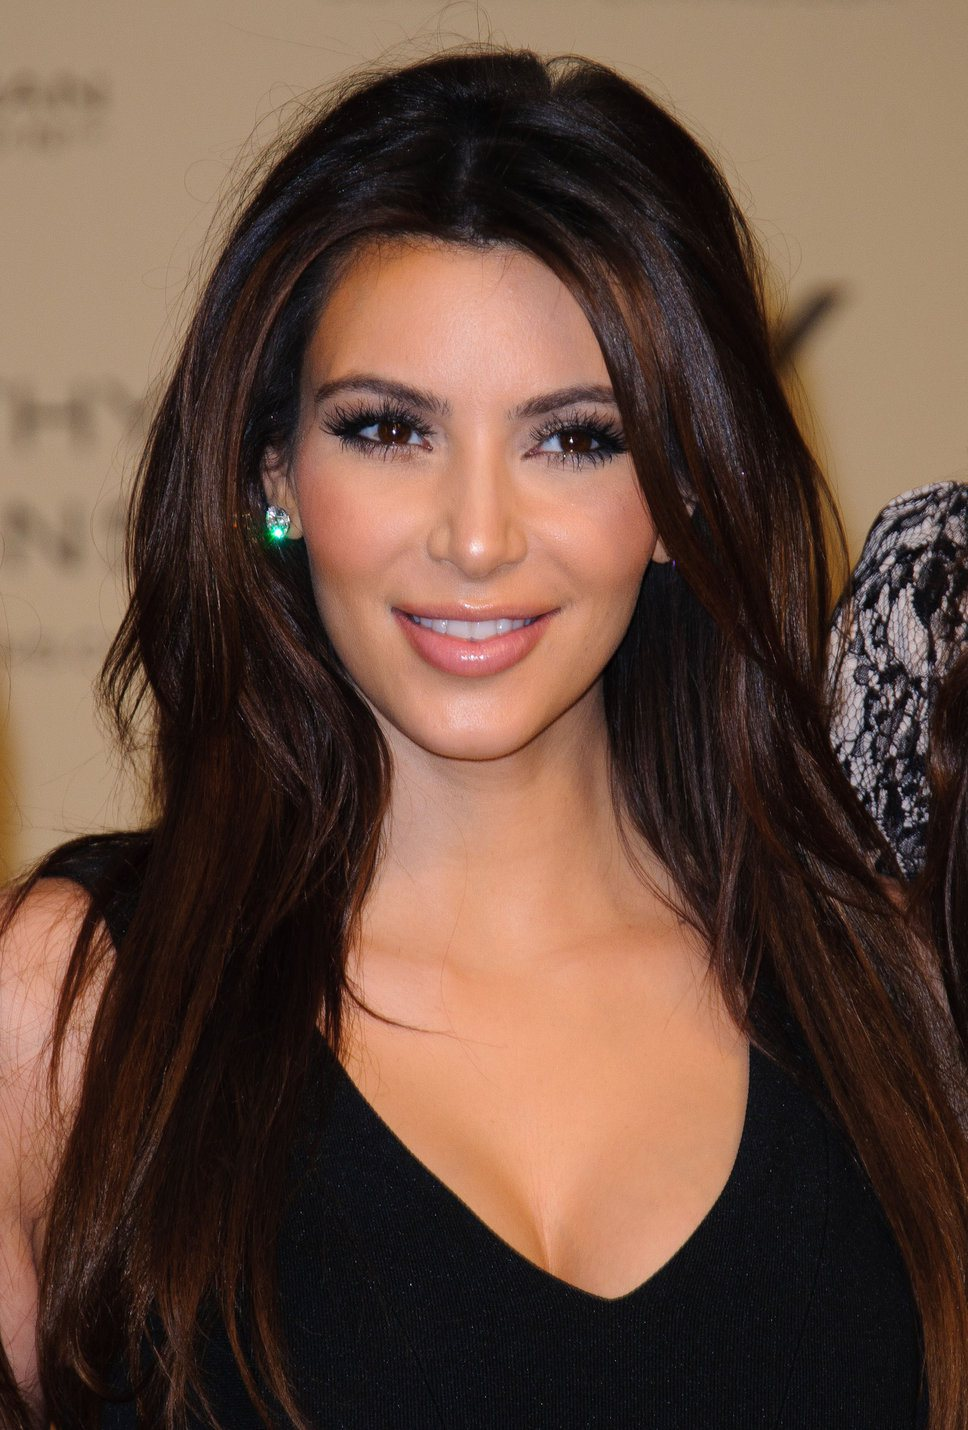 kim_kardashian_and_kanye_west kim_kardashian_and_kanye_west